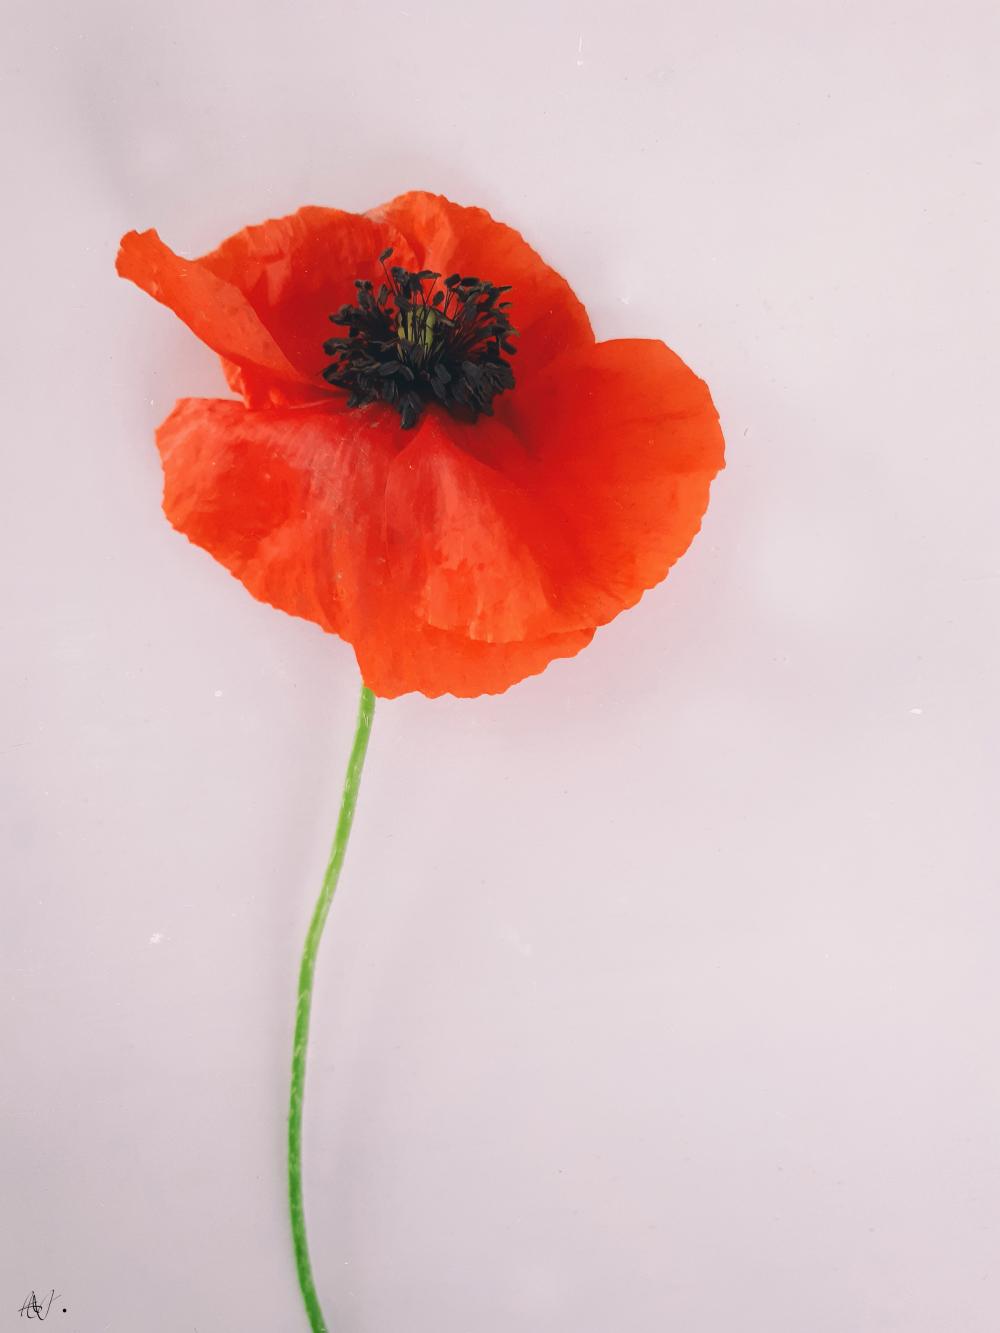 A beautiful poppy